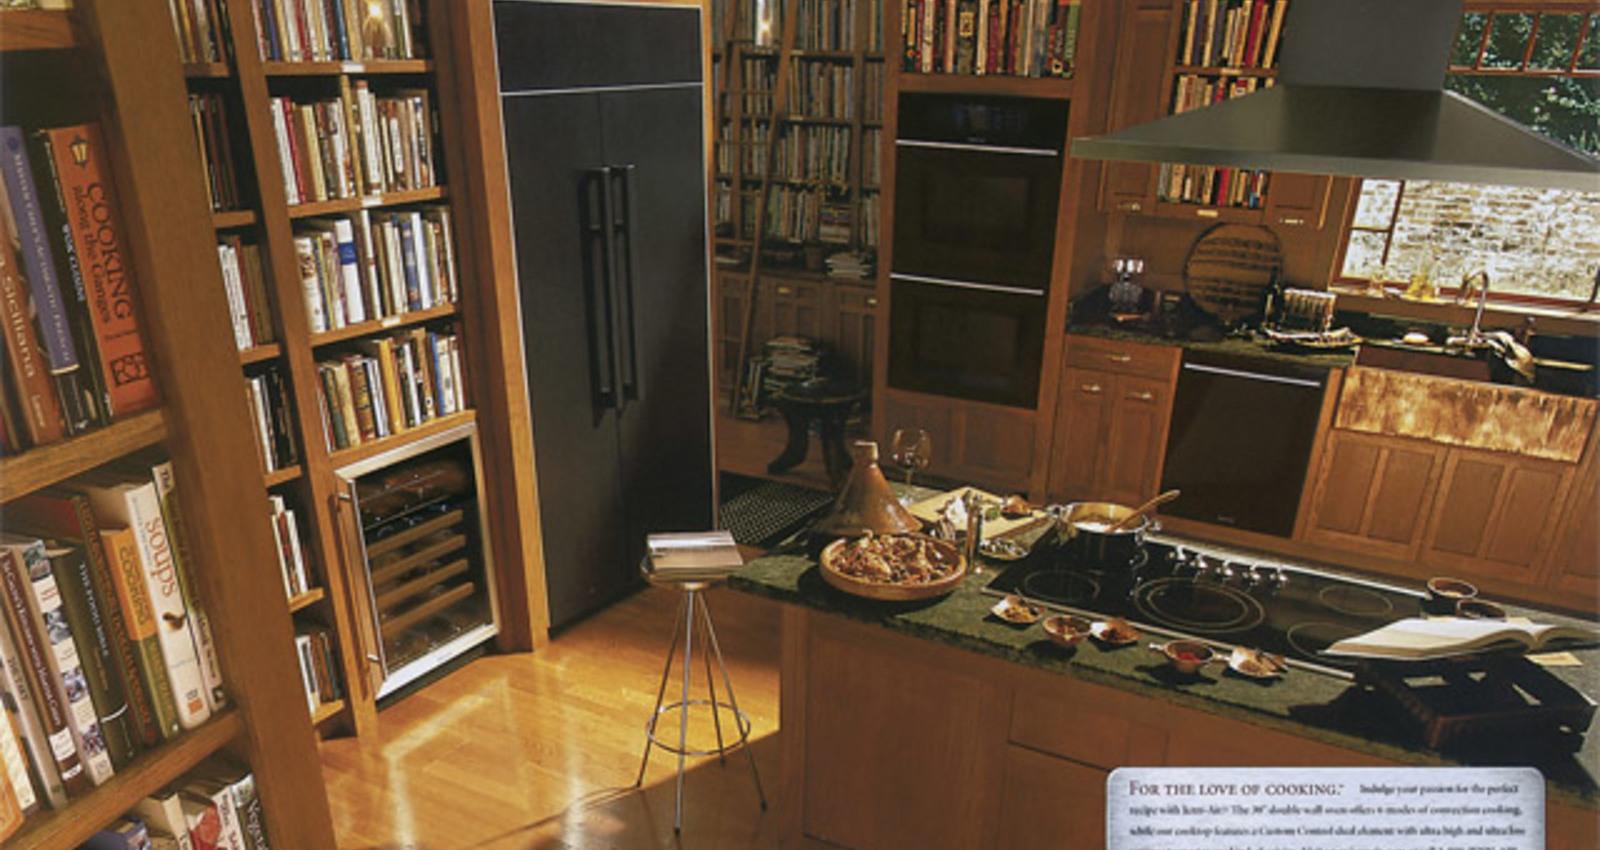 Kitchen, Library, Entertainment Center